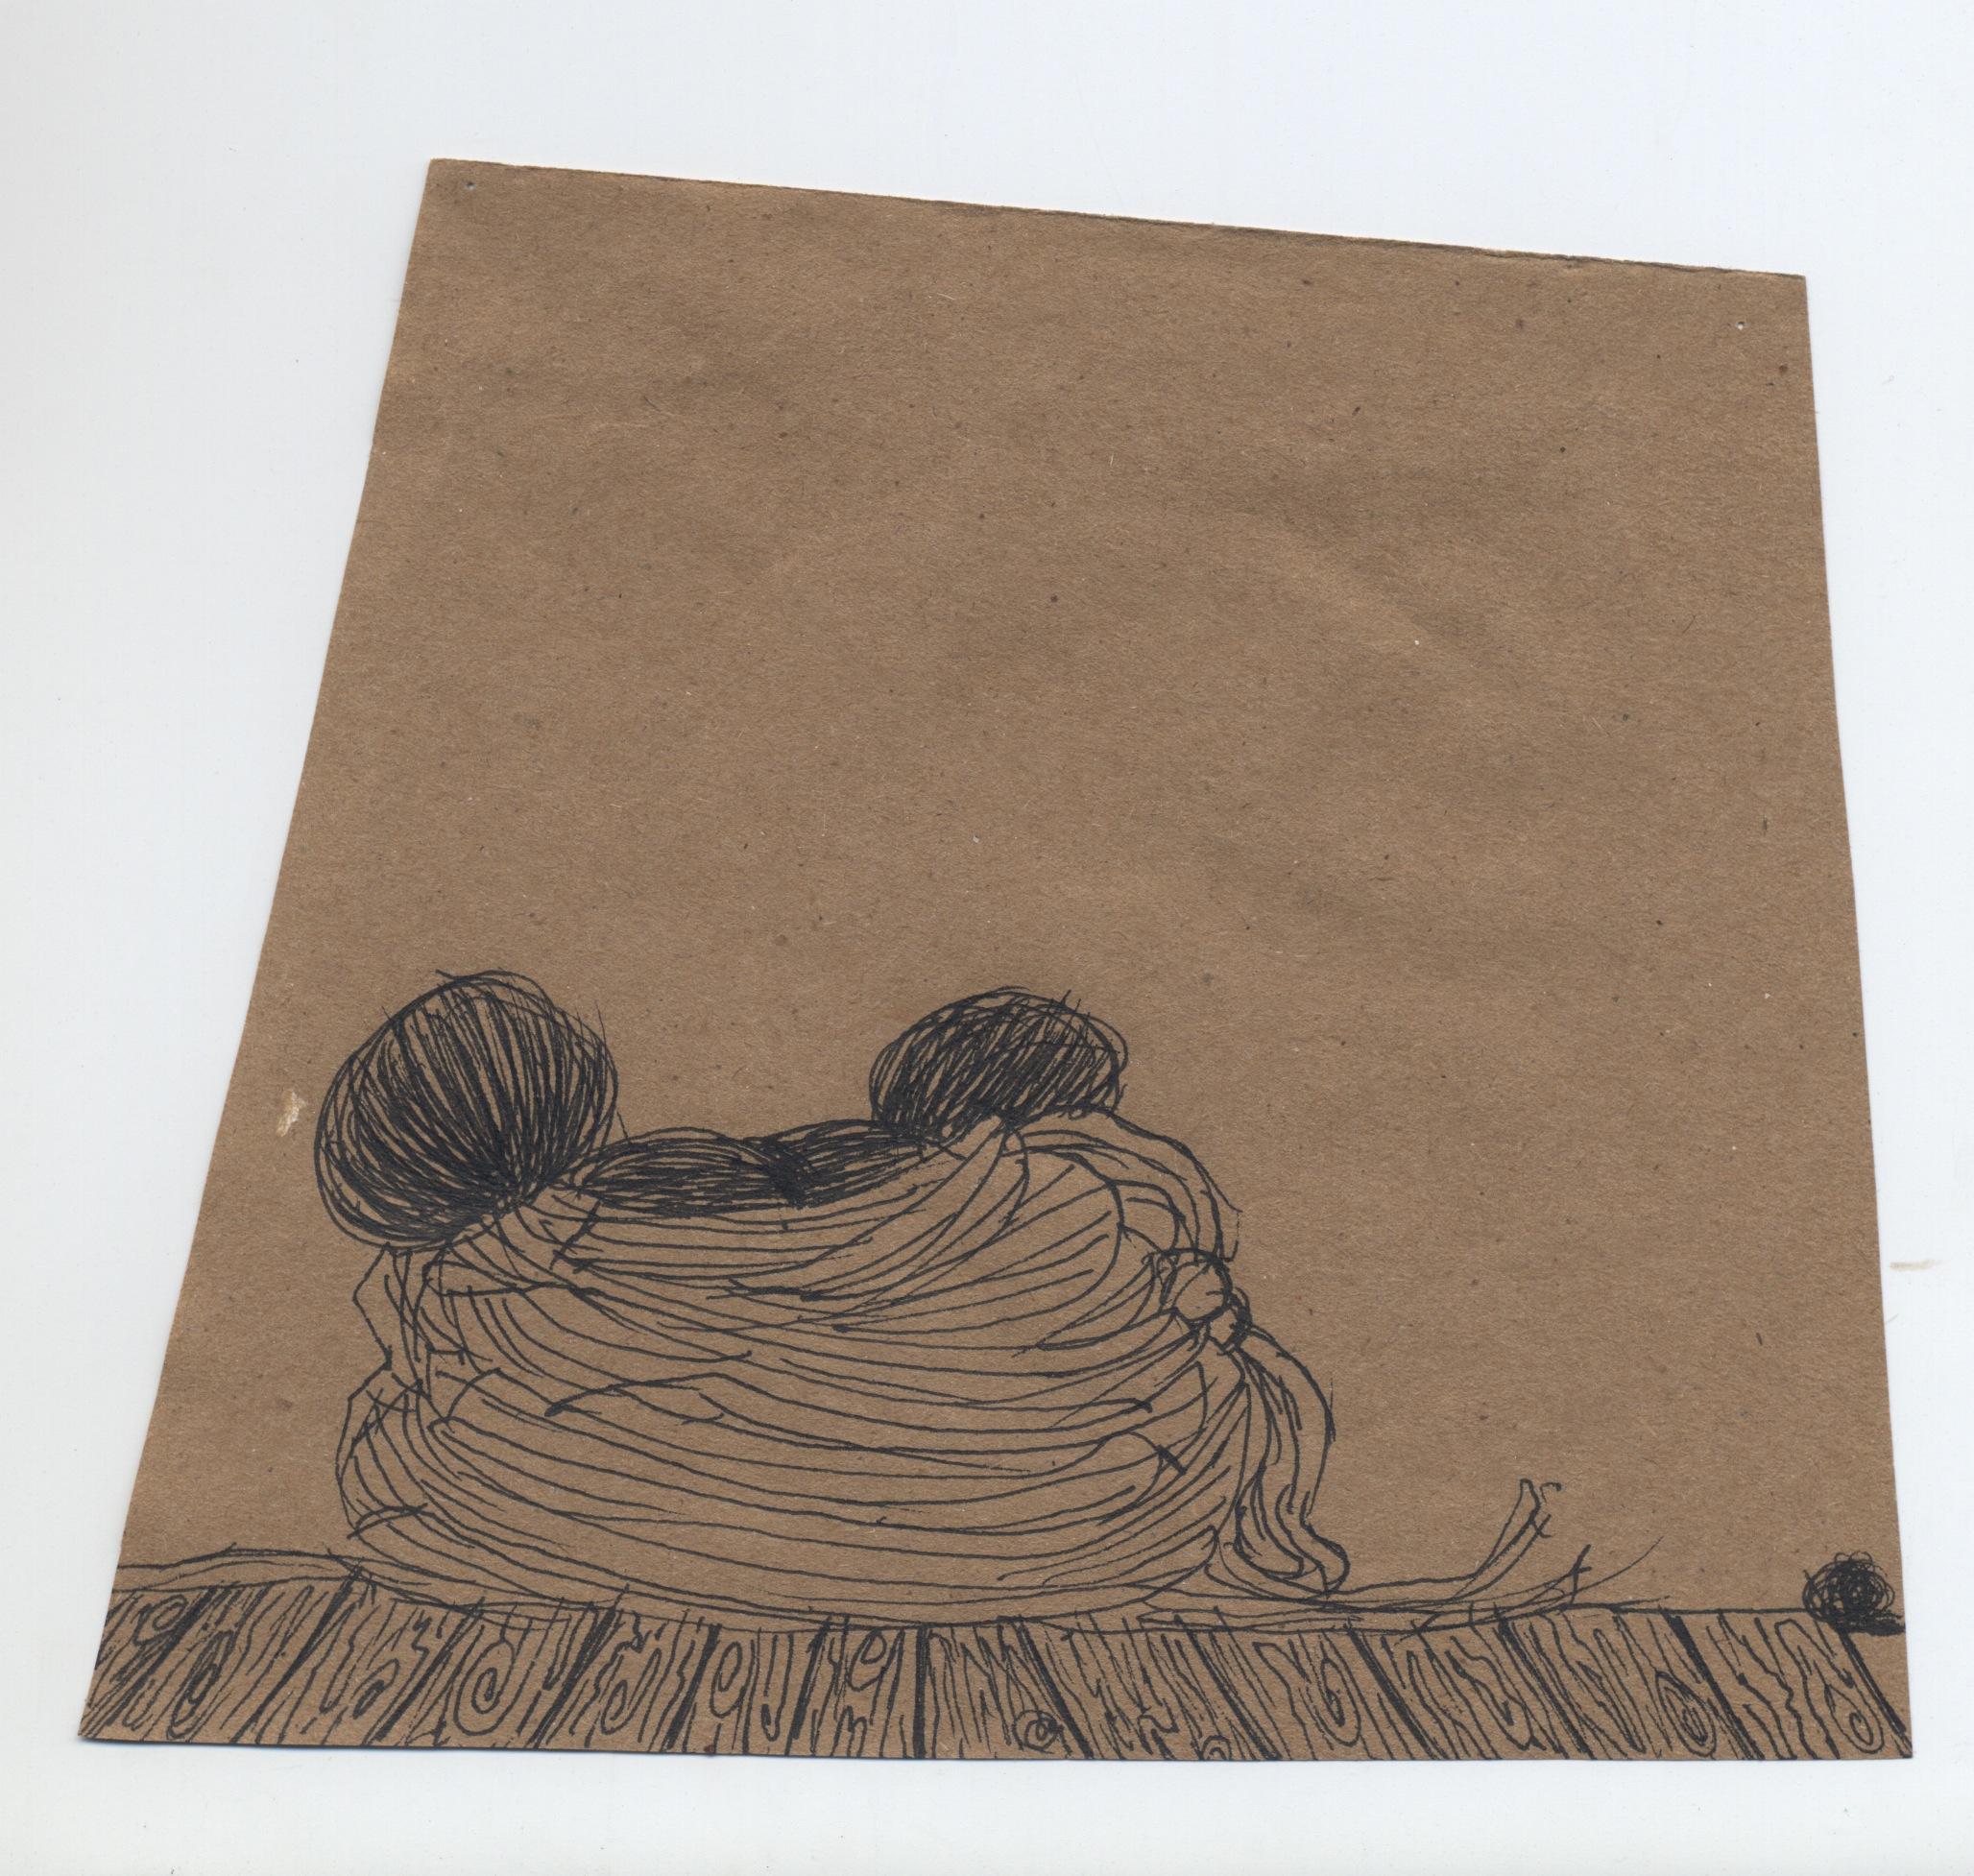 burrow  pen & ink on kraft paper 2011